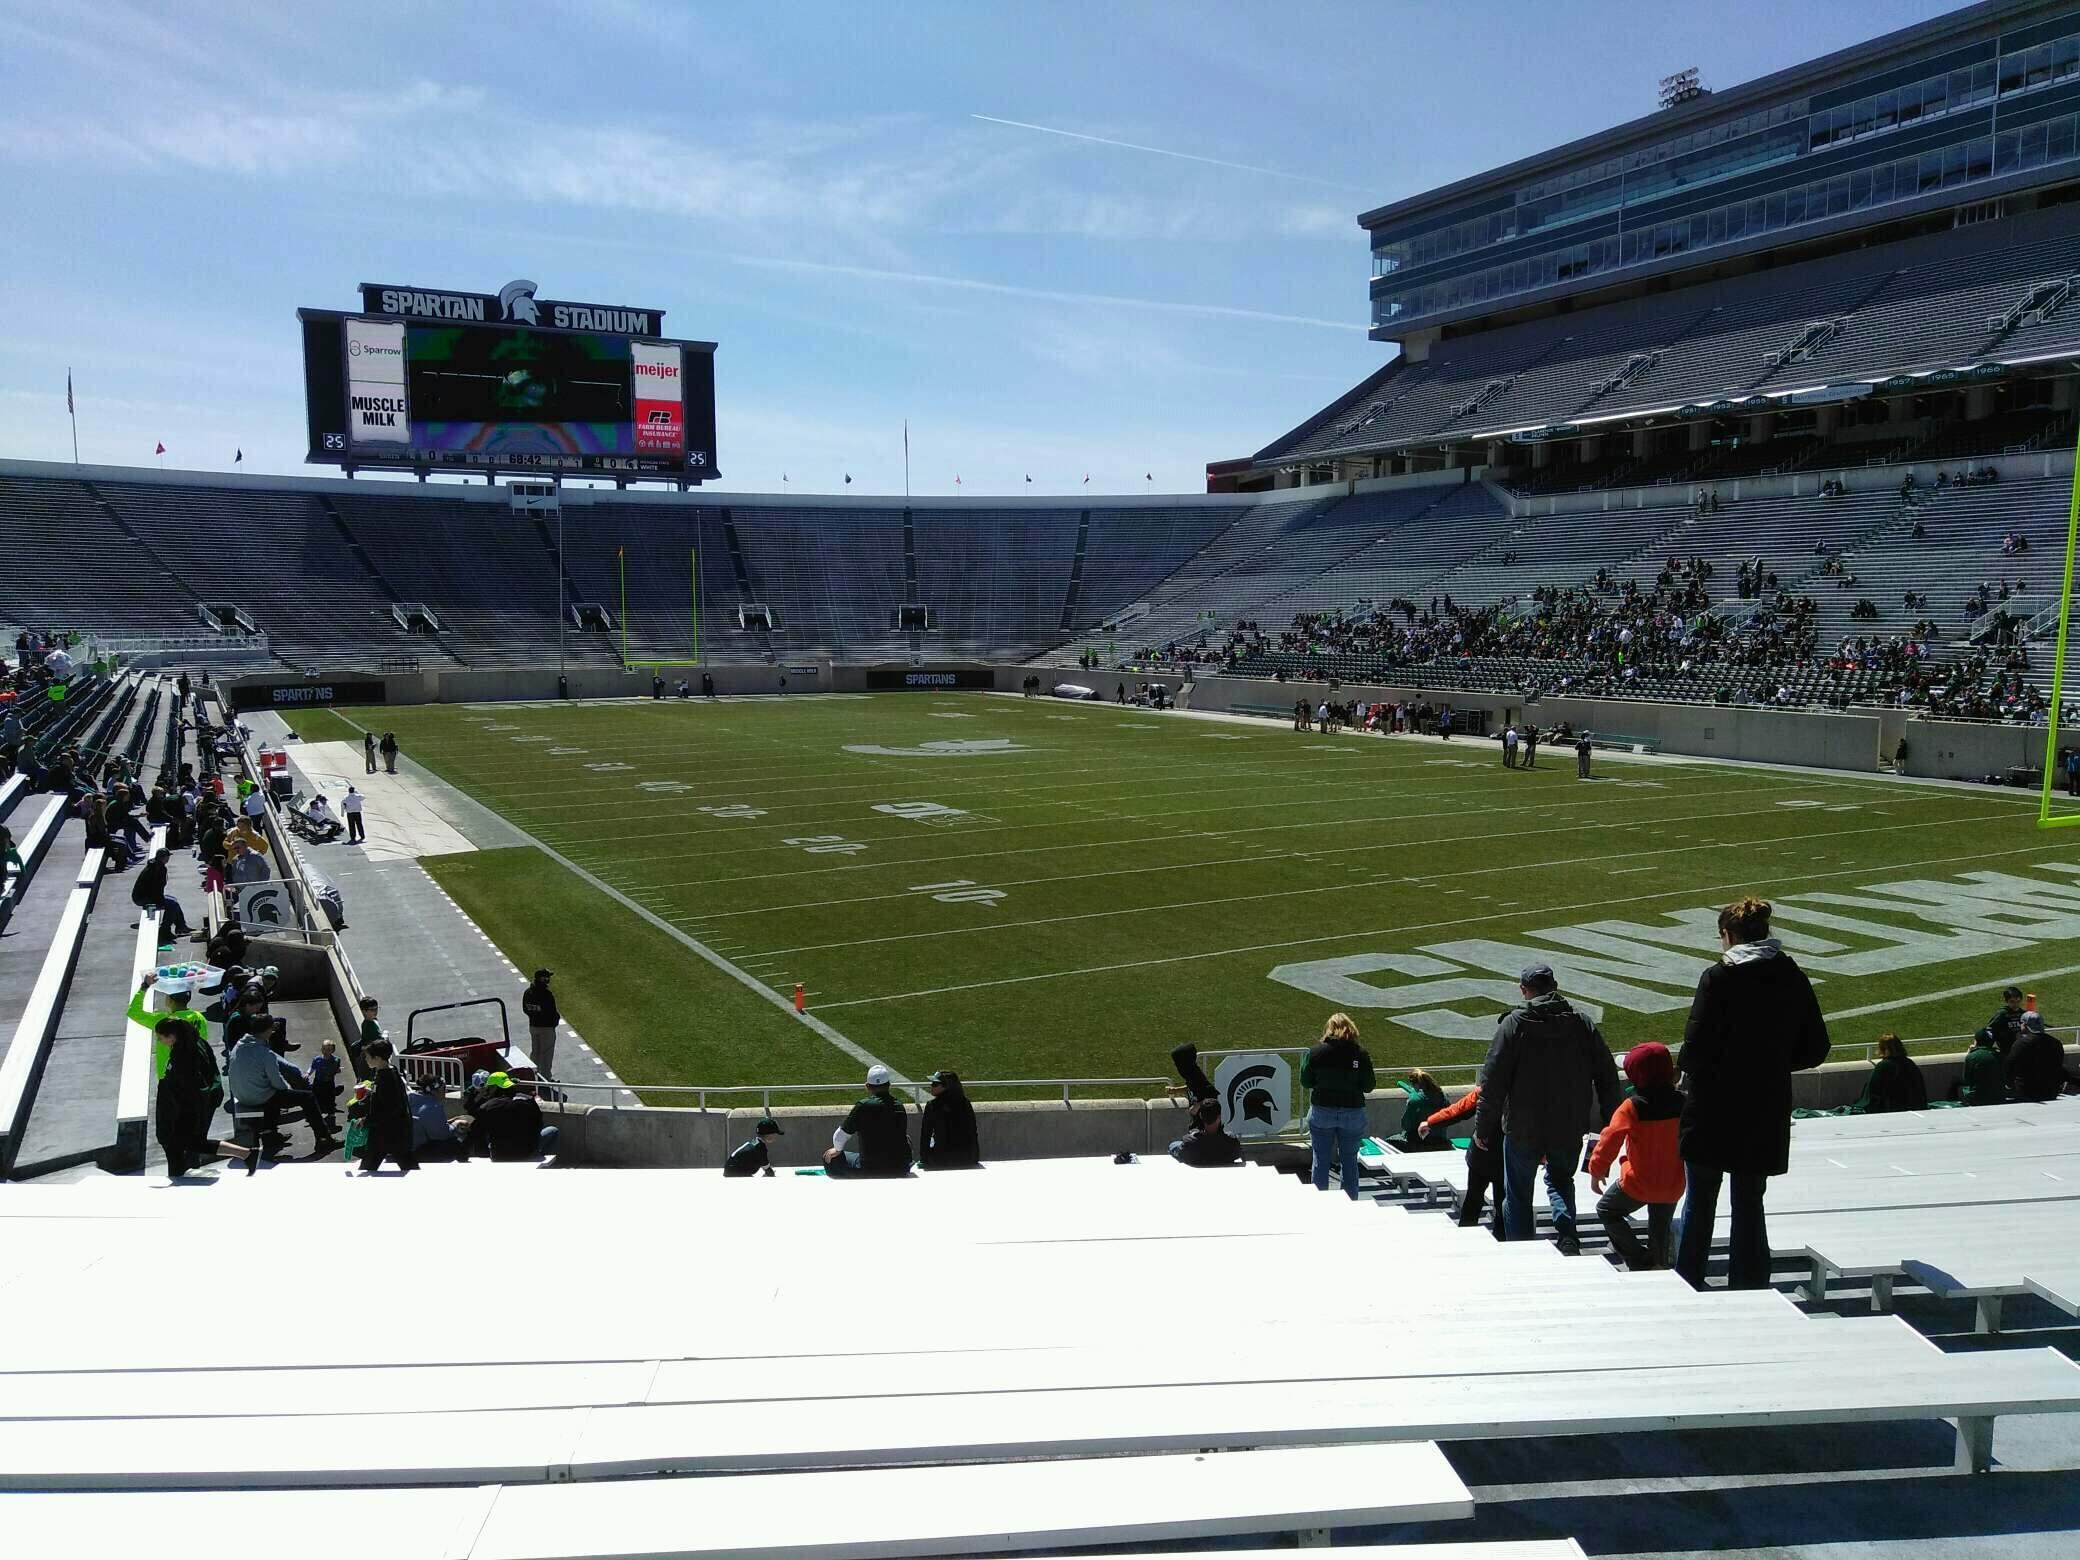 Spartan Stadium Section 3 Row 24 Seat 44